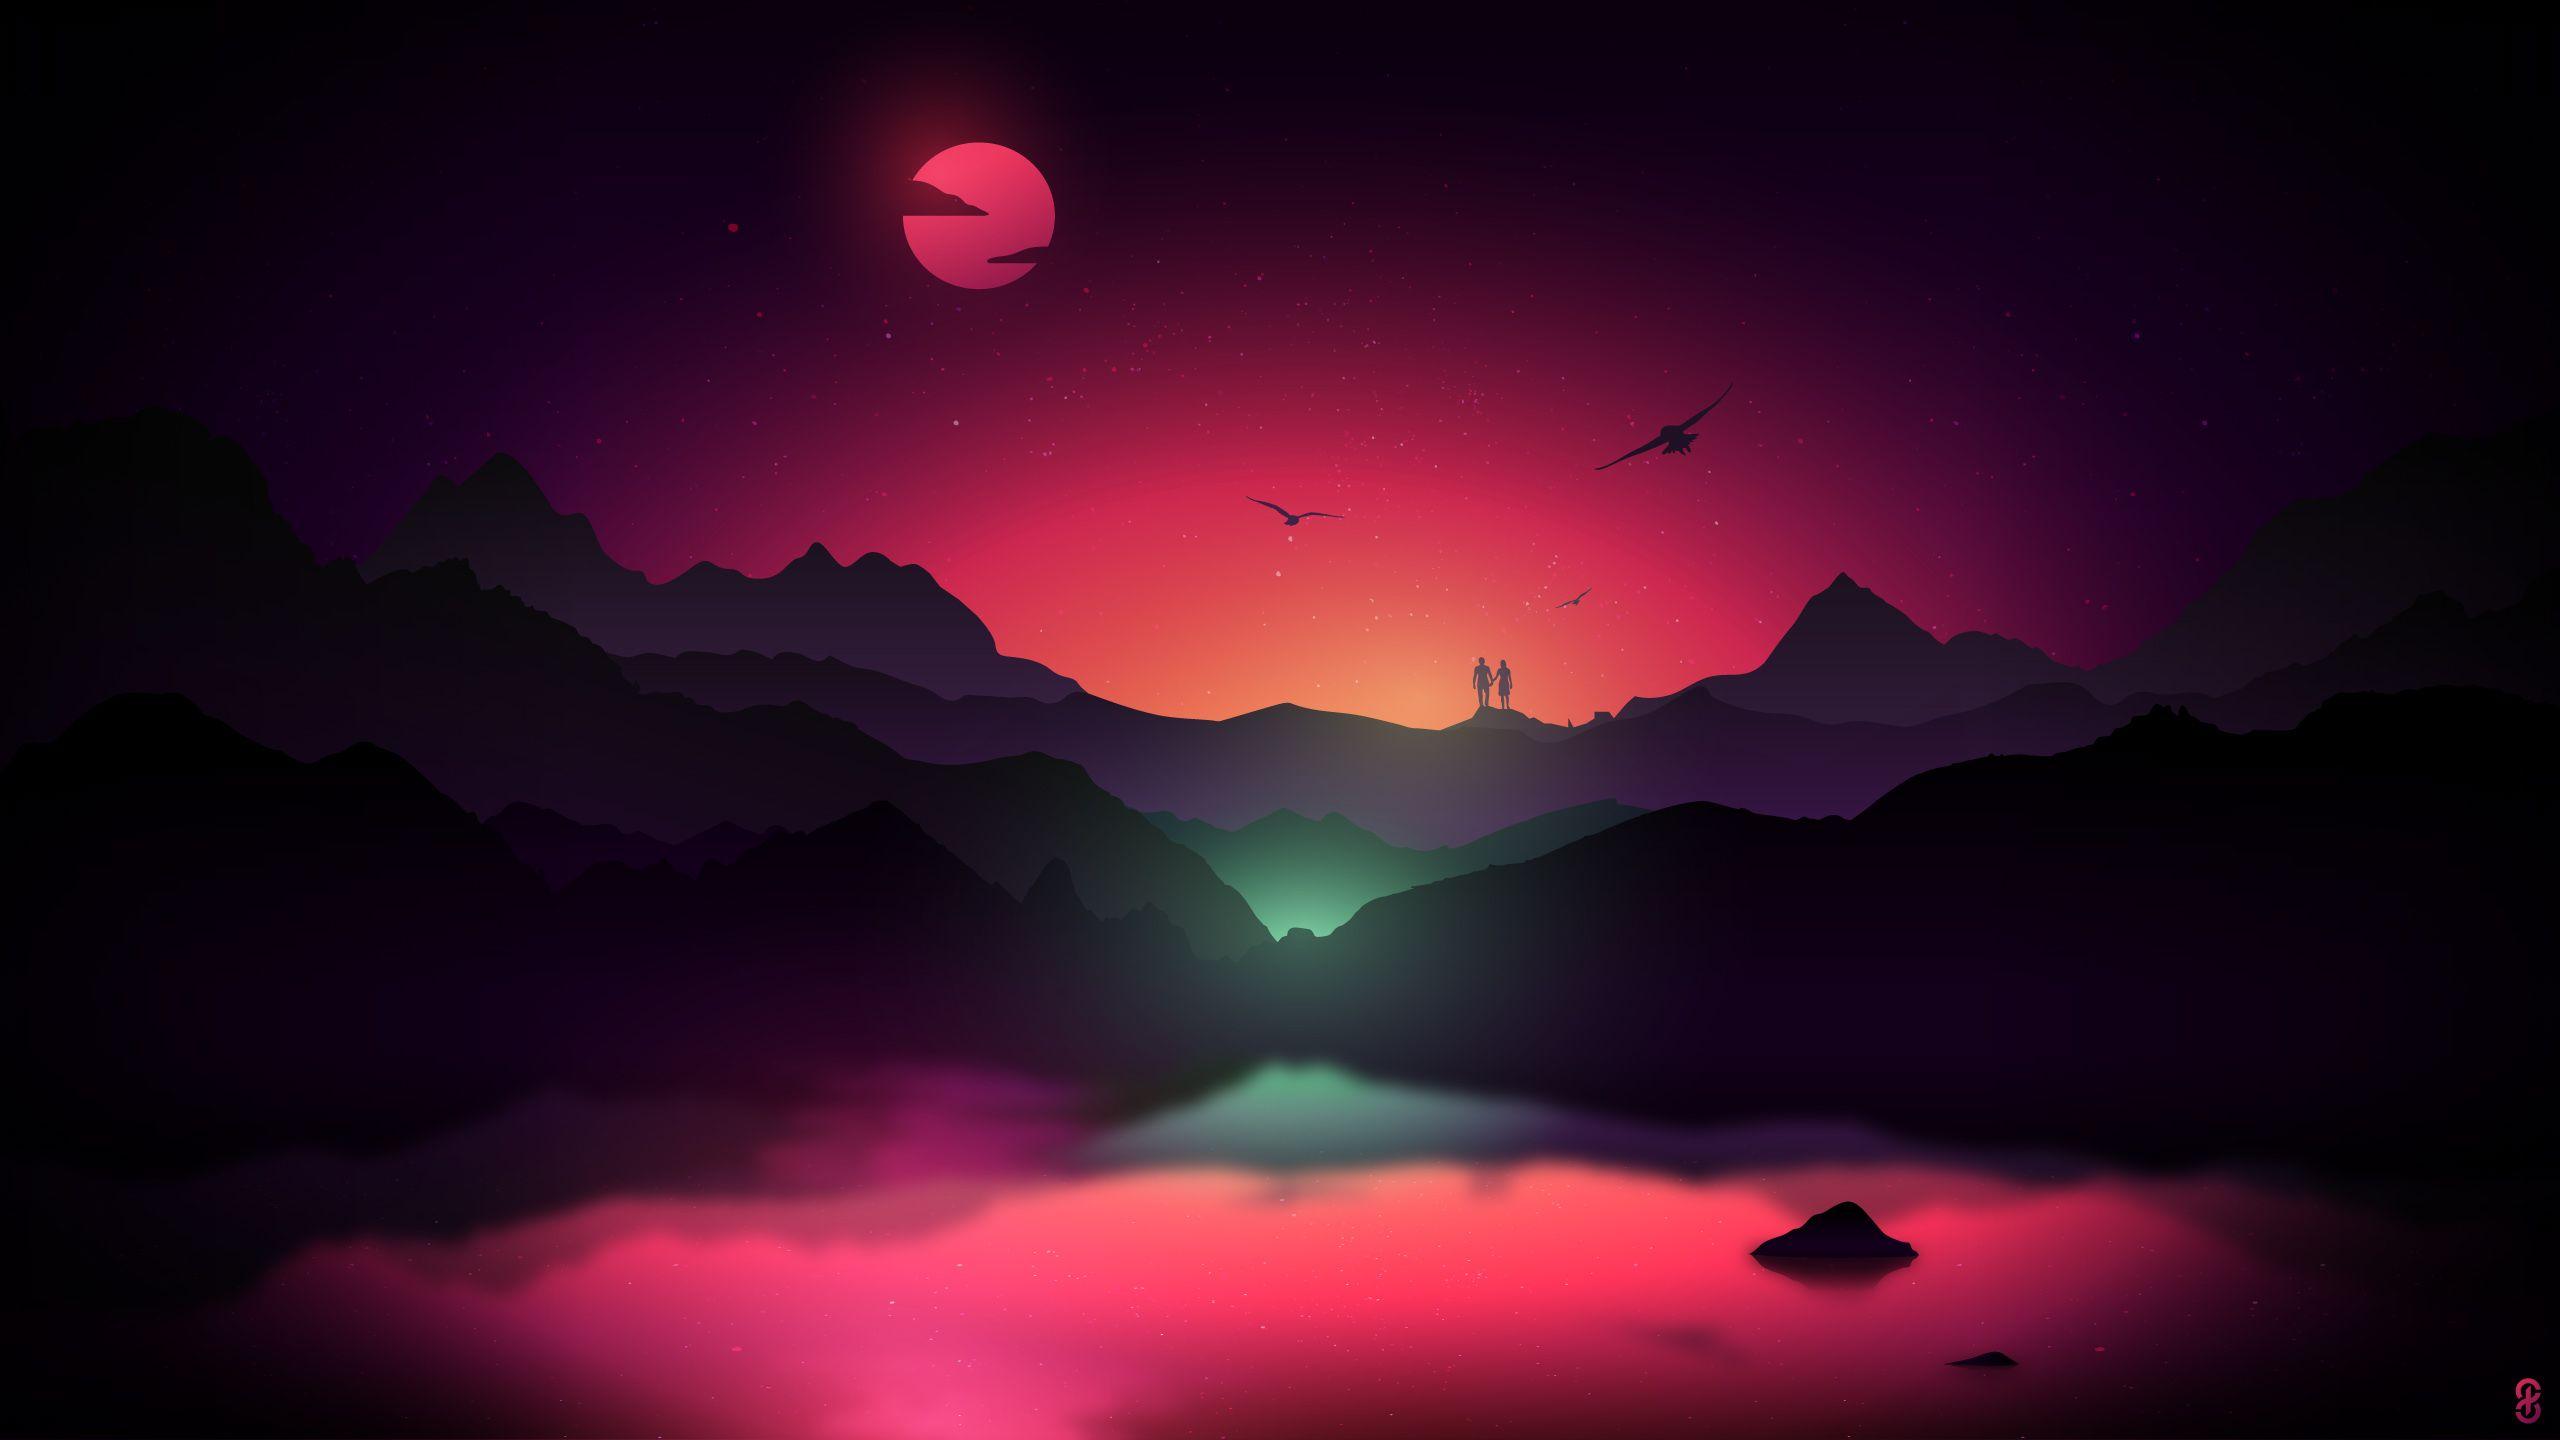 Fantasy Artist Love Couple Digital Art Hd In 2020 Landscape Wallpaper Scenic Landscape Landscape Illustration